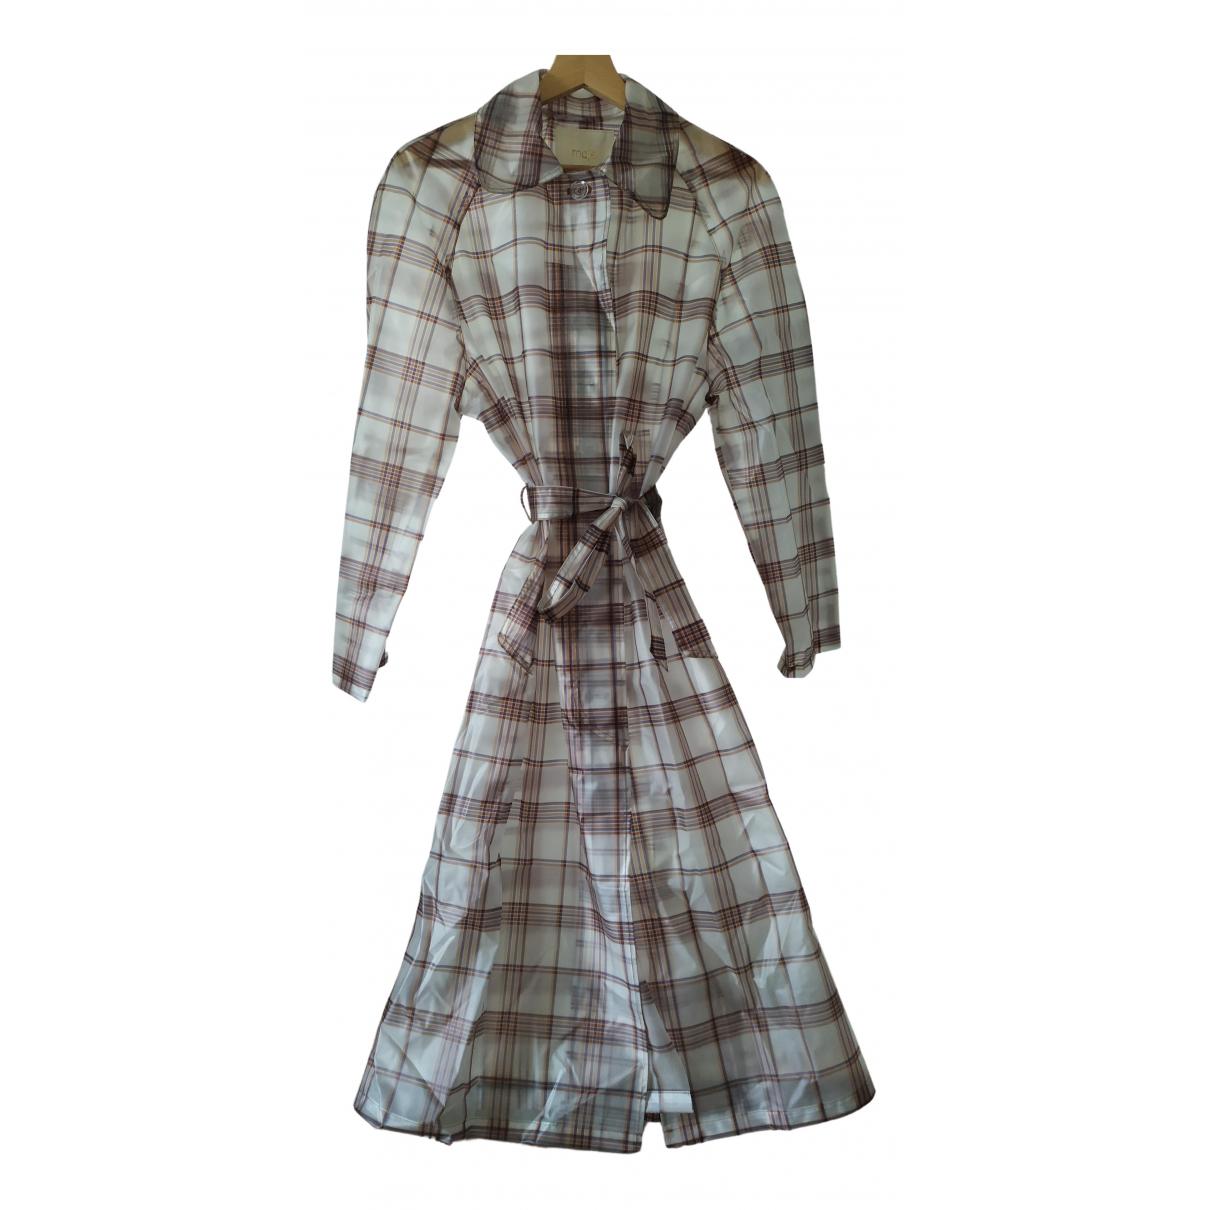 Maje Spring Summer 2019 Multicolour Trench coat for Women 36 FR